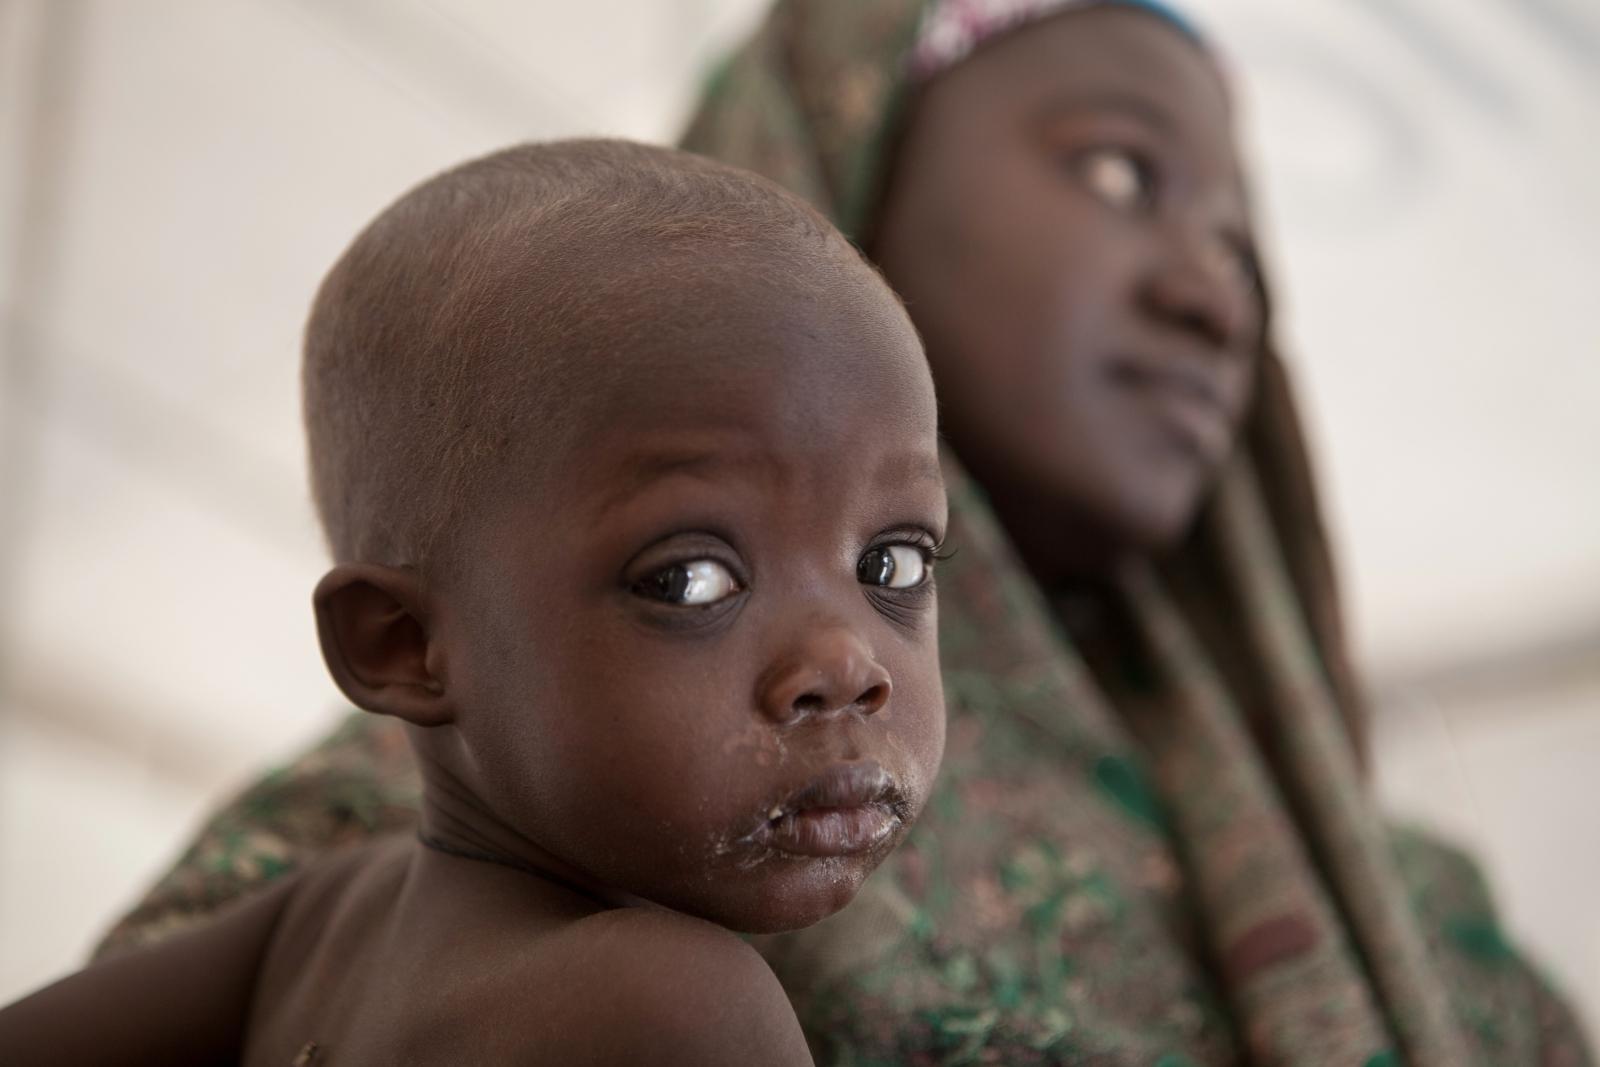 Nigerian baby